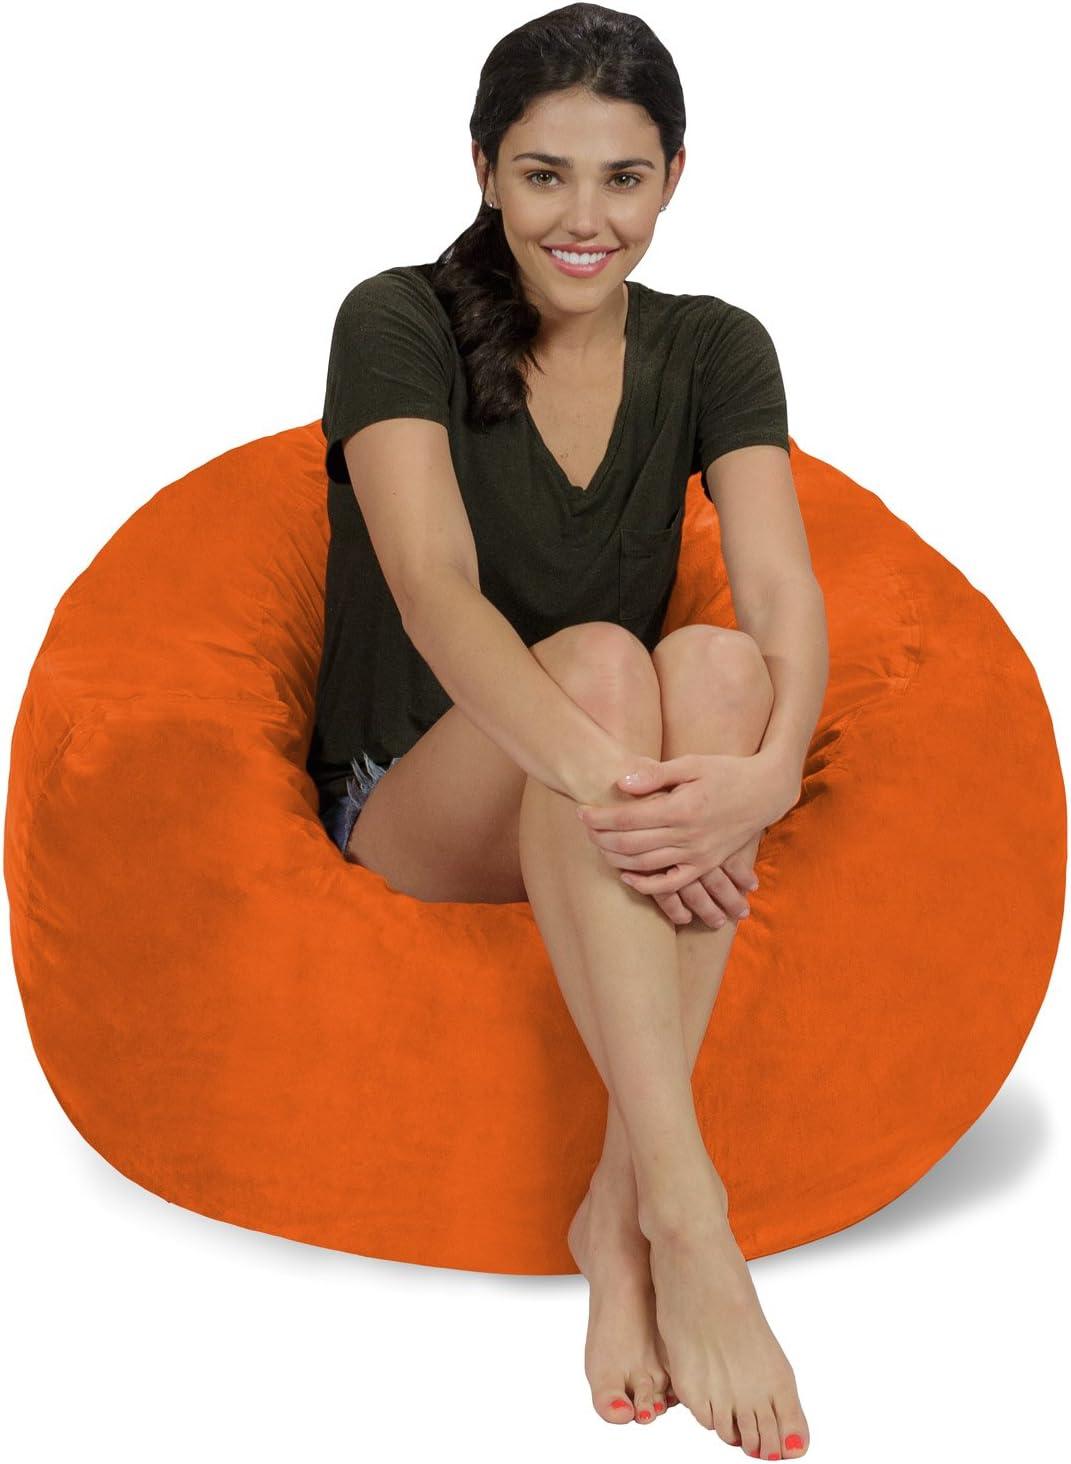 Chill Sack Bean Bag Chair: Large 3' Memory Foam Furniture Bean Bag - Big Sofa with Soft Micro Fiber Cover - Orange Micro Suede